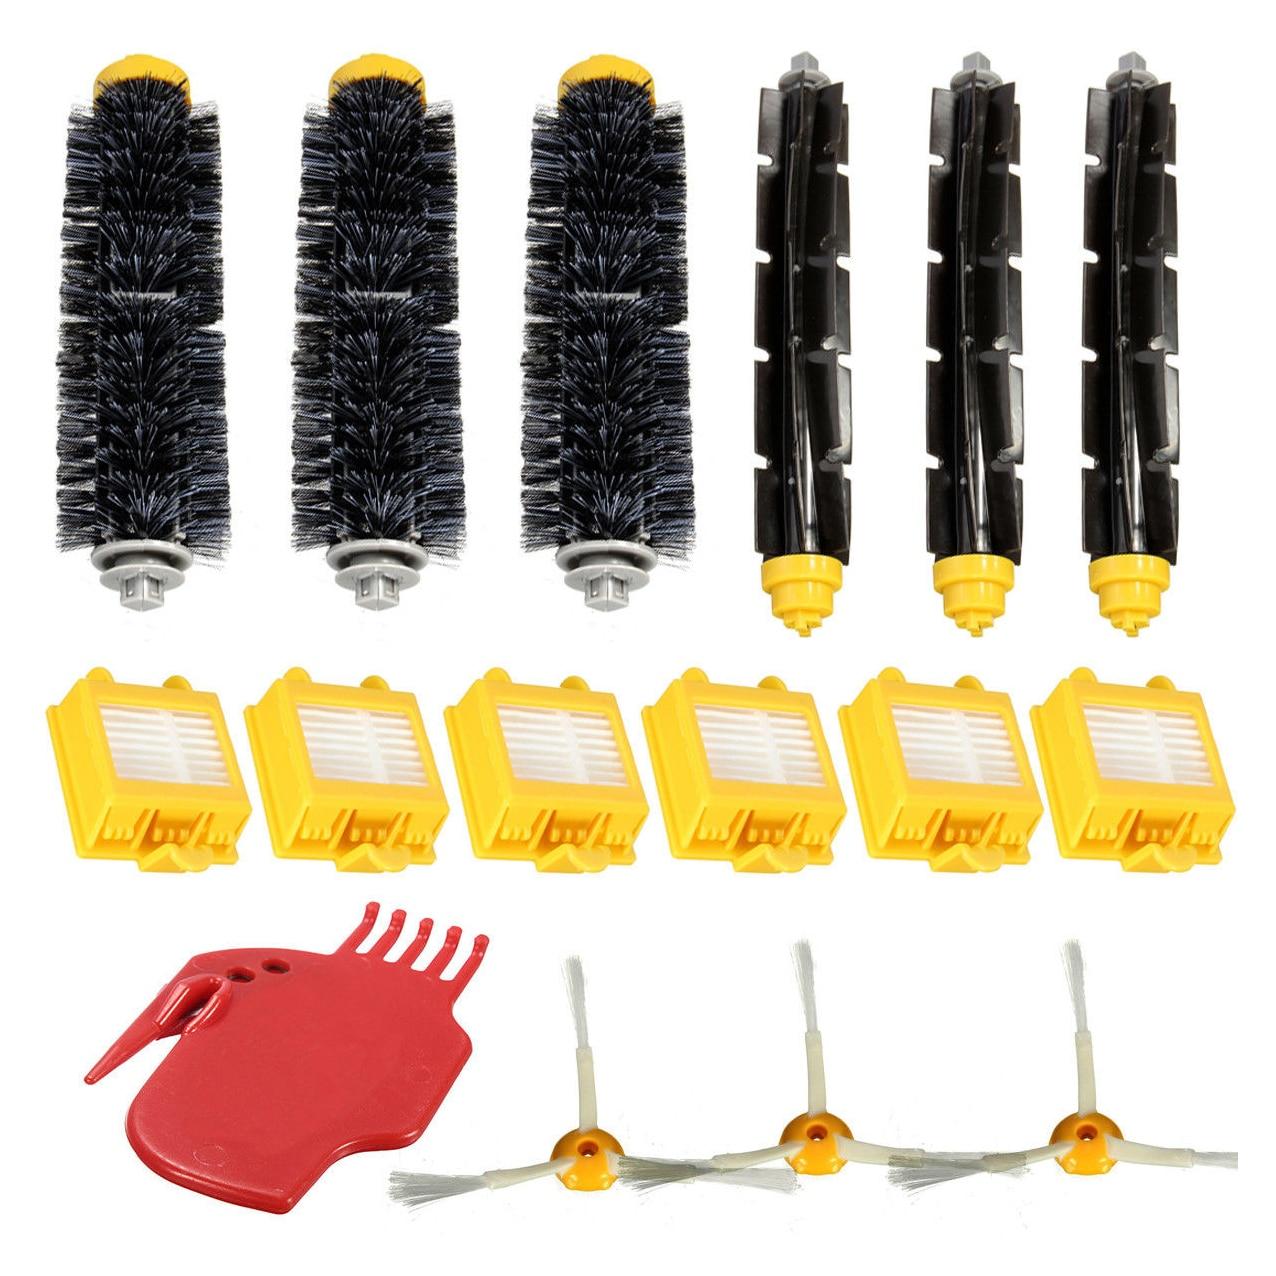 EAS-Filters Pack 3 Armed Side Brush Kit For iRobot Roomba Vacuum 700 760 770 780